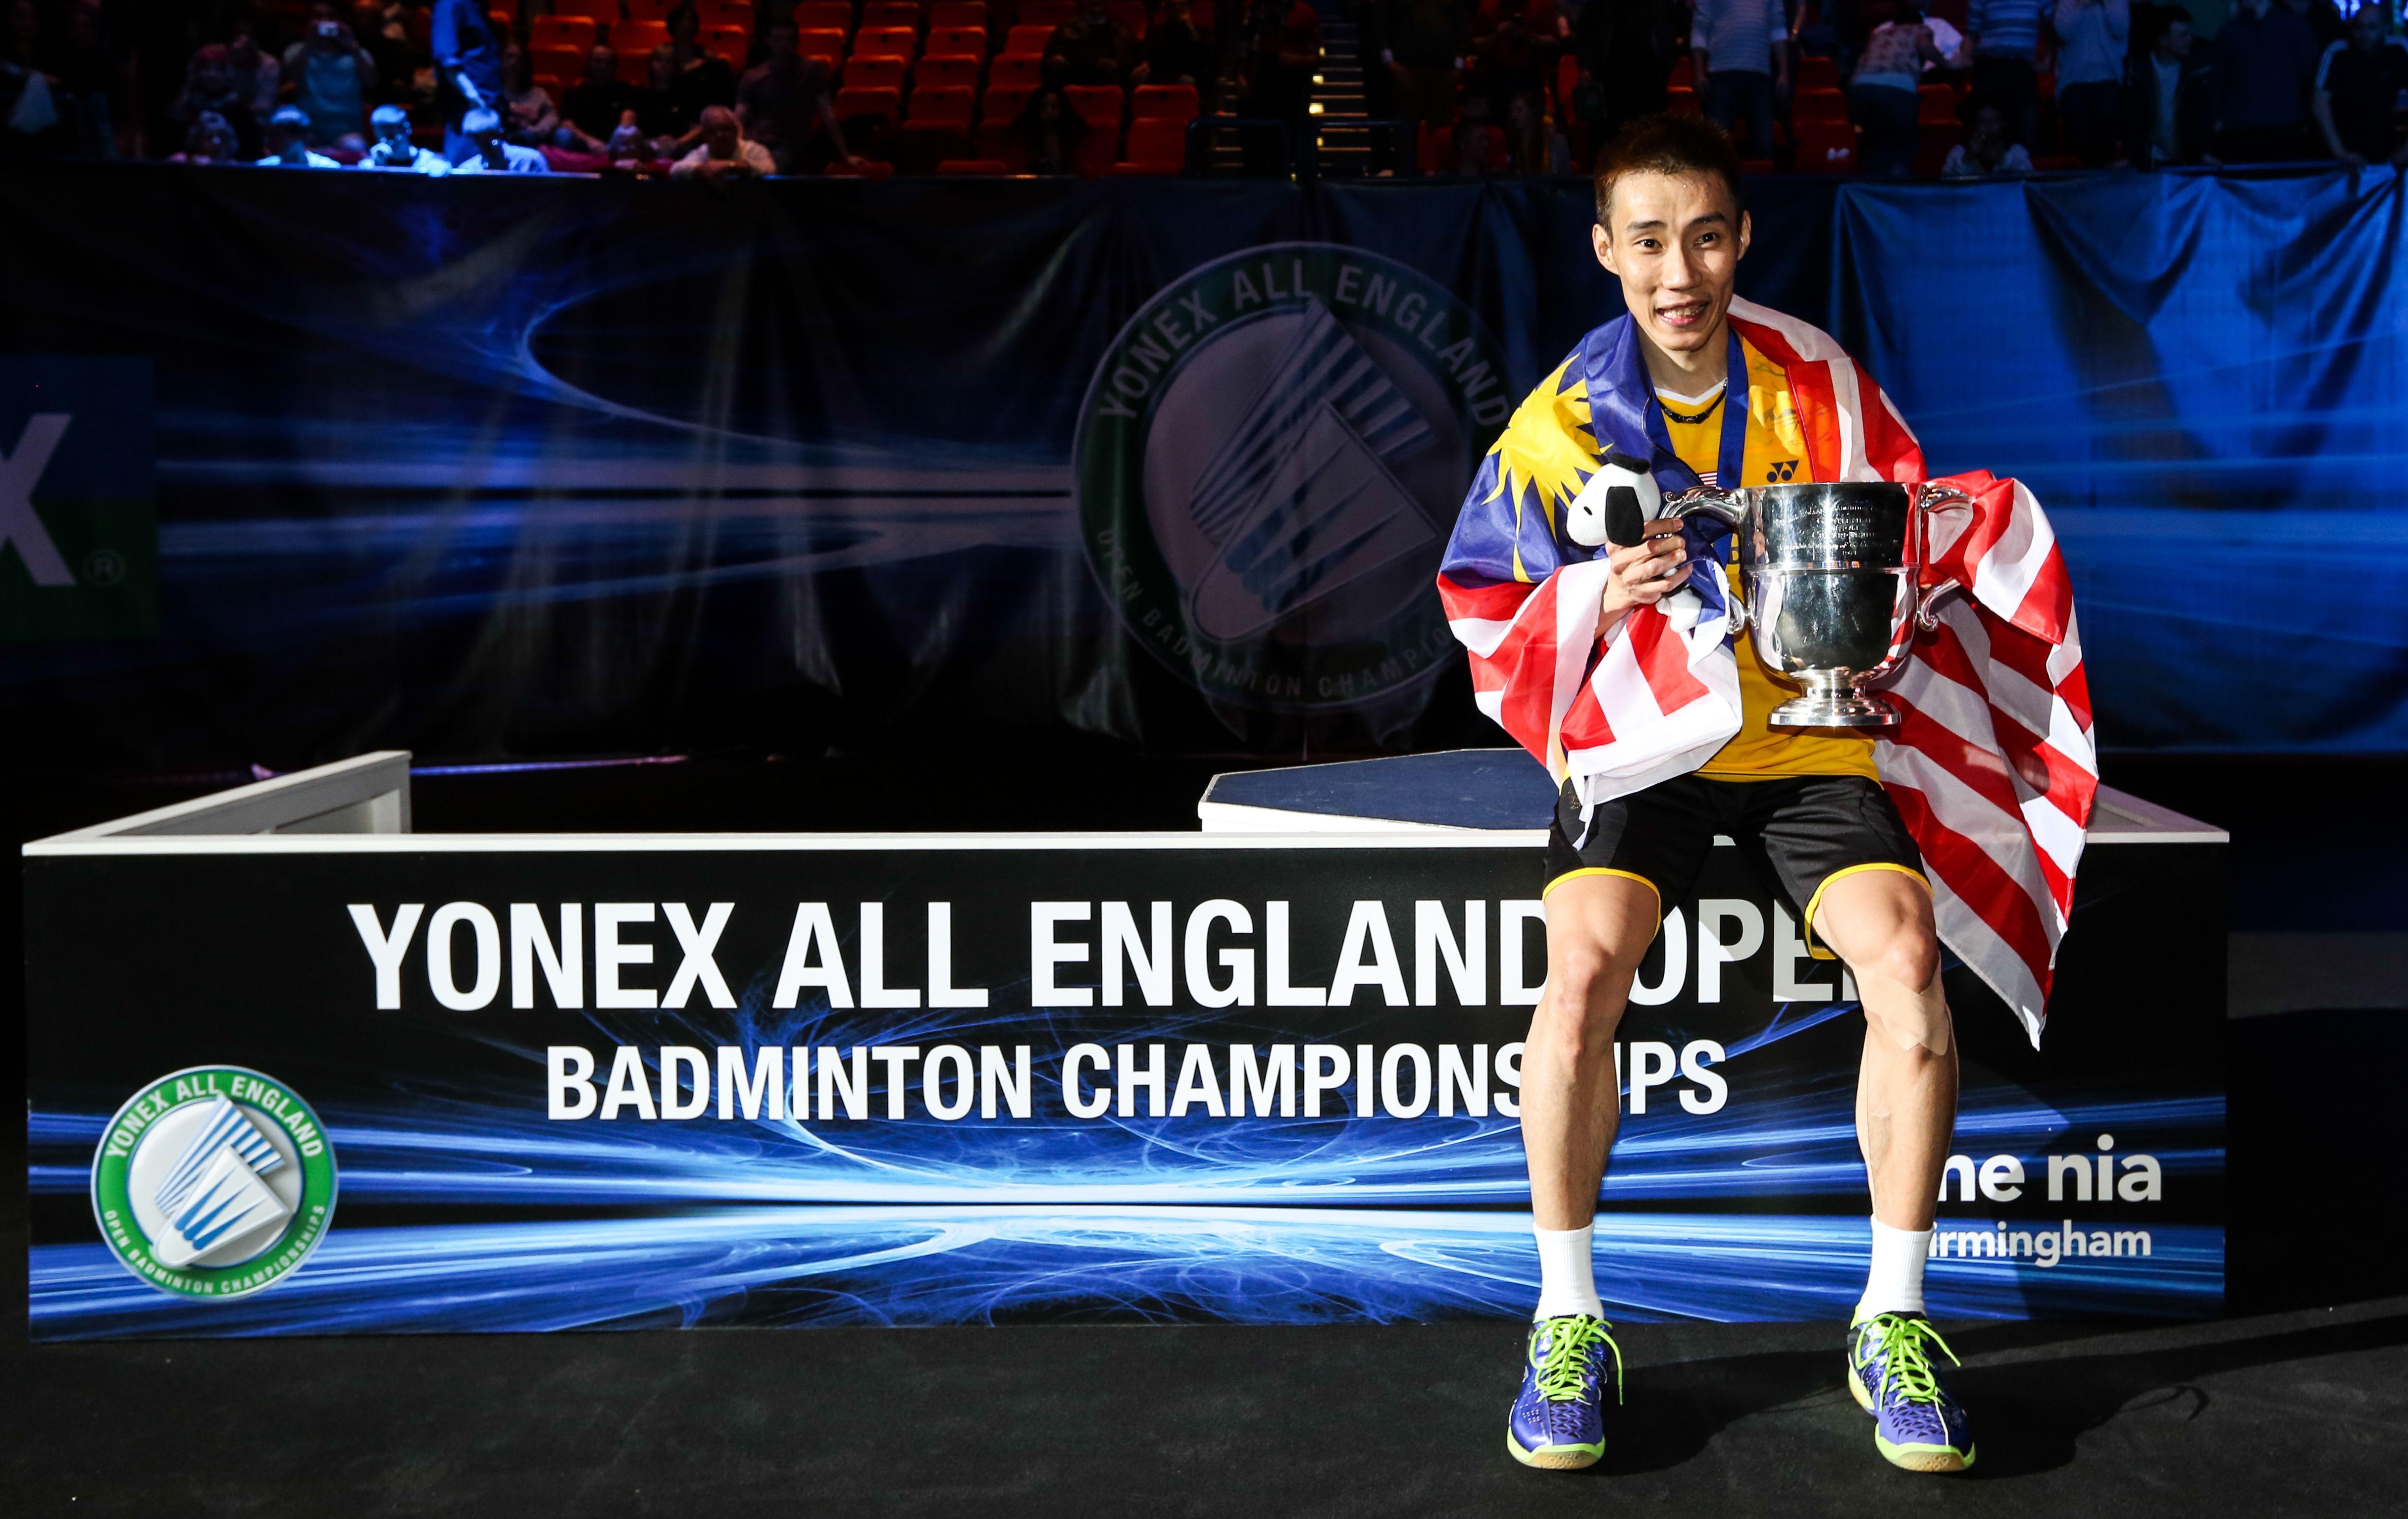 Three Time Yonex All England Open Champion Yonex Badminton Champion